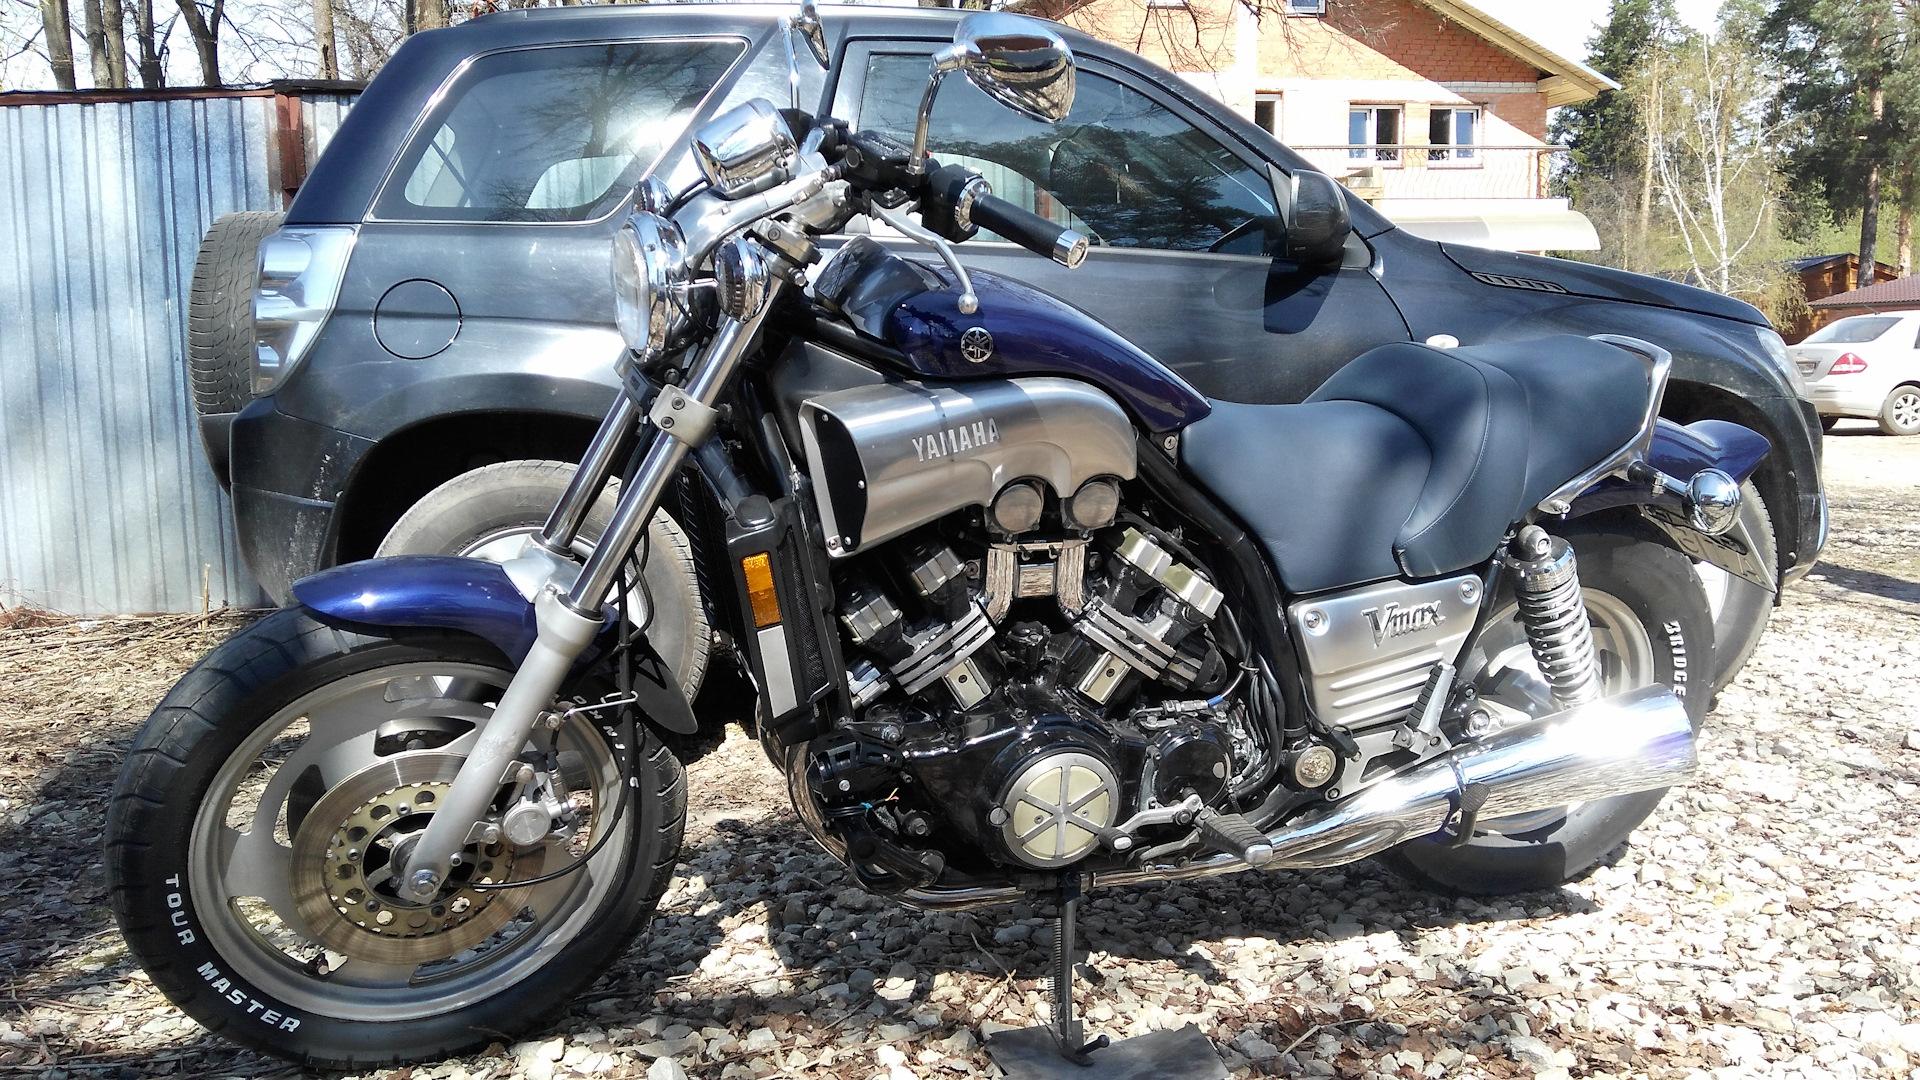 Тест-драйв мотоцикла Yamaha V-max 1200